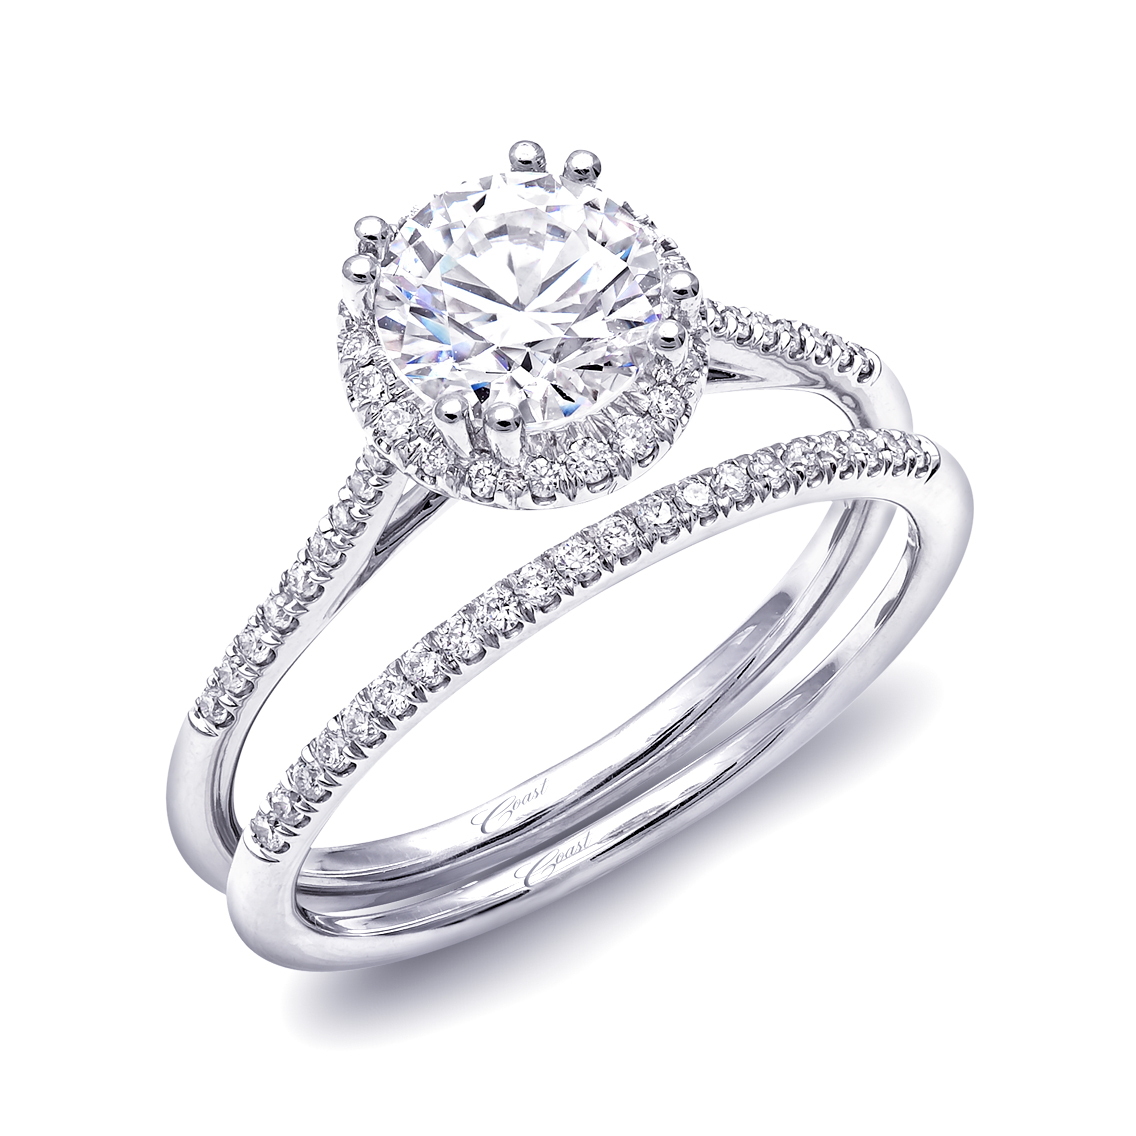 Charisma Engagement Ring - Petite Round Halo